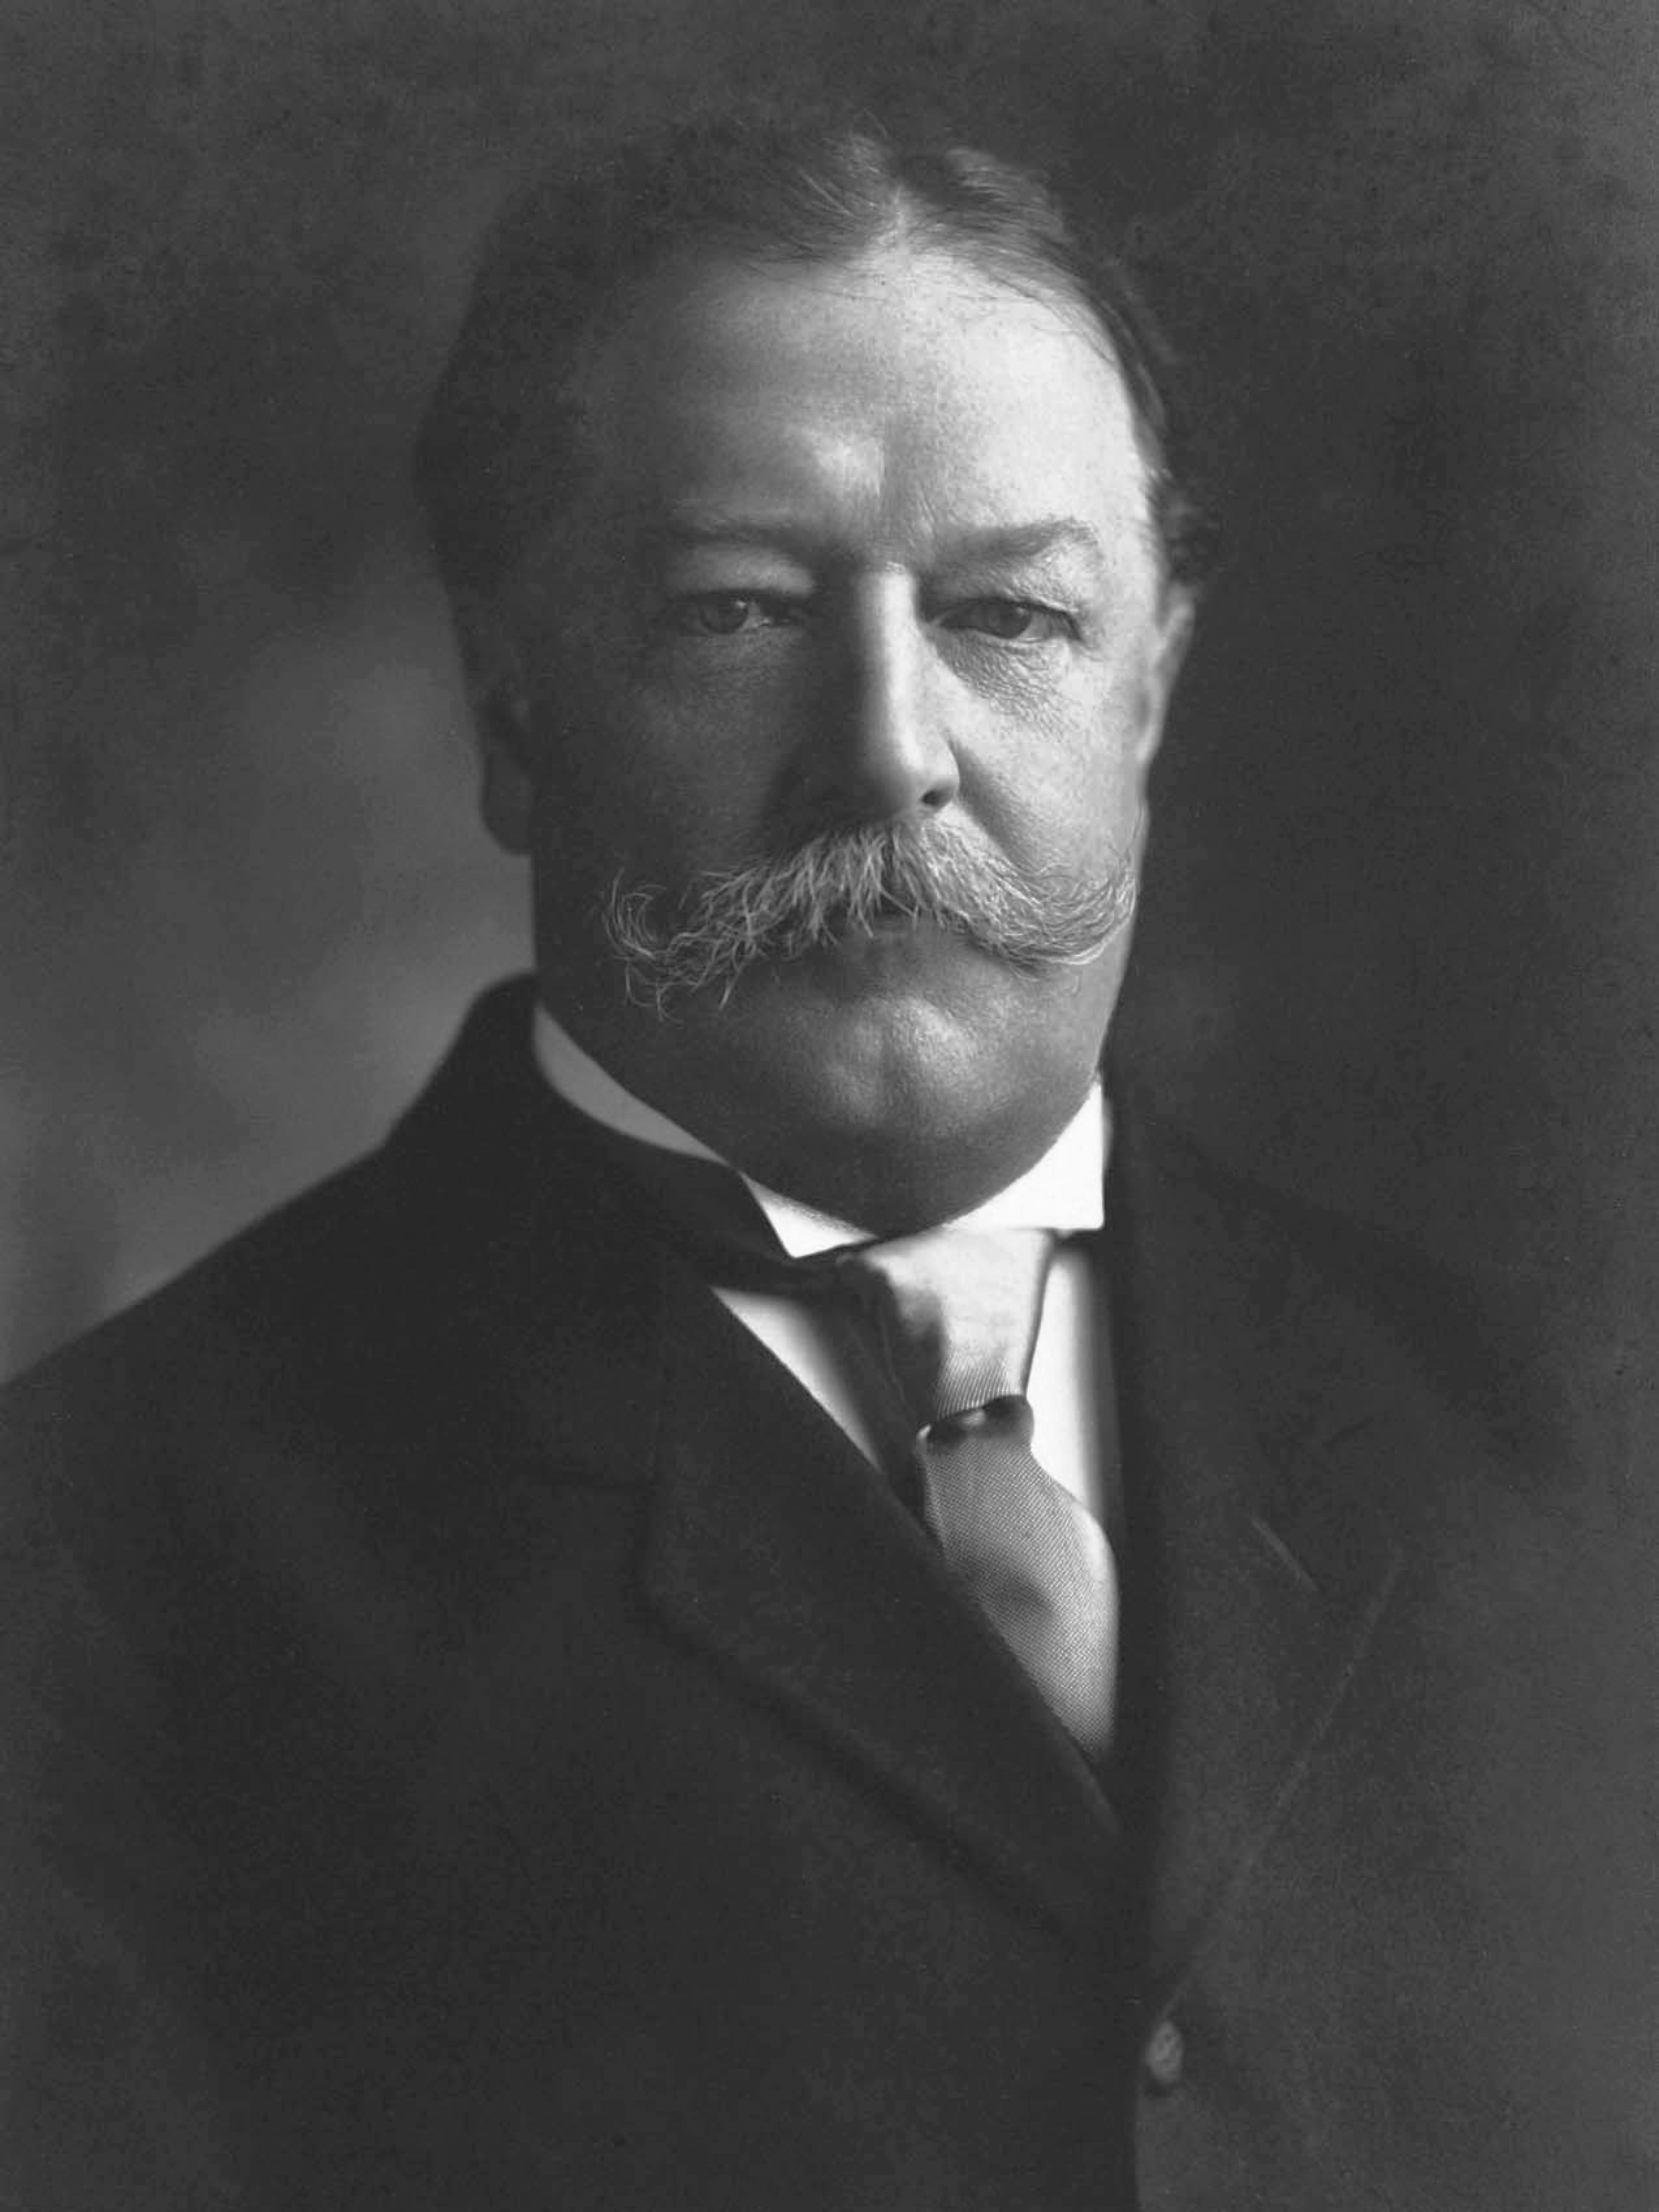 Description William Howard Taft - Harris and Ewing jpgWilliam Taft